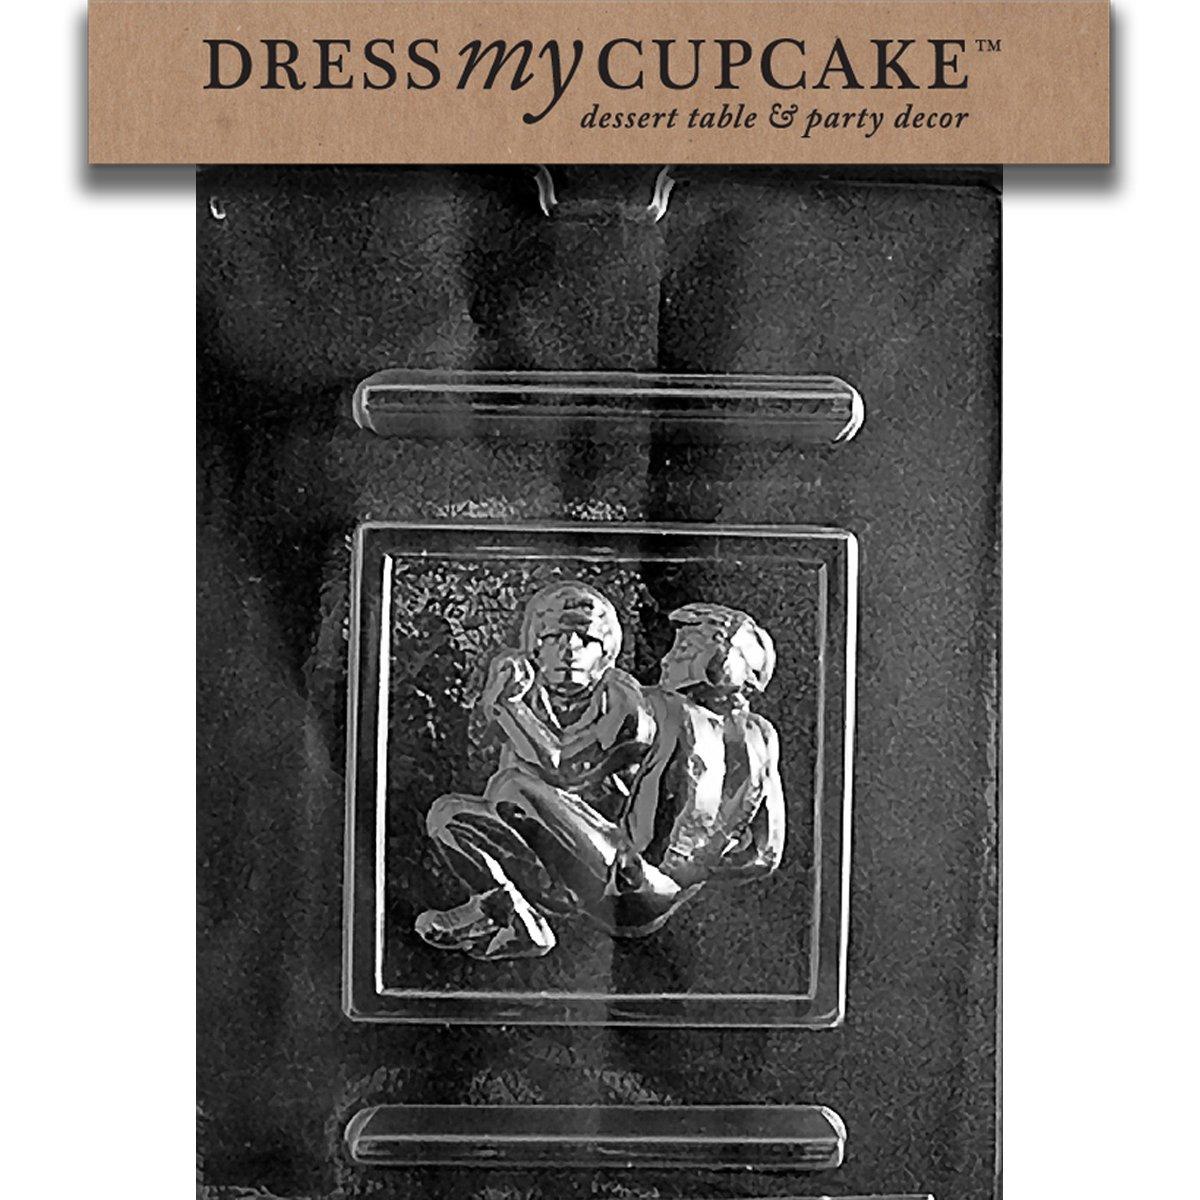 Dress My Cupcake Chocolate Candy Mold, Wrestling